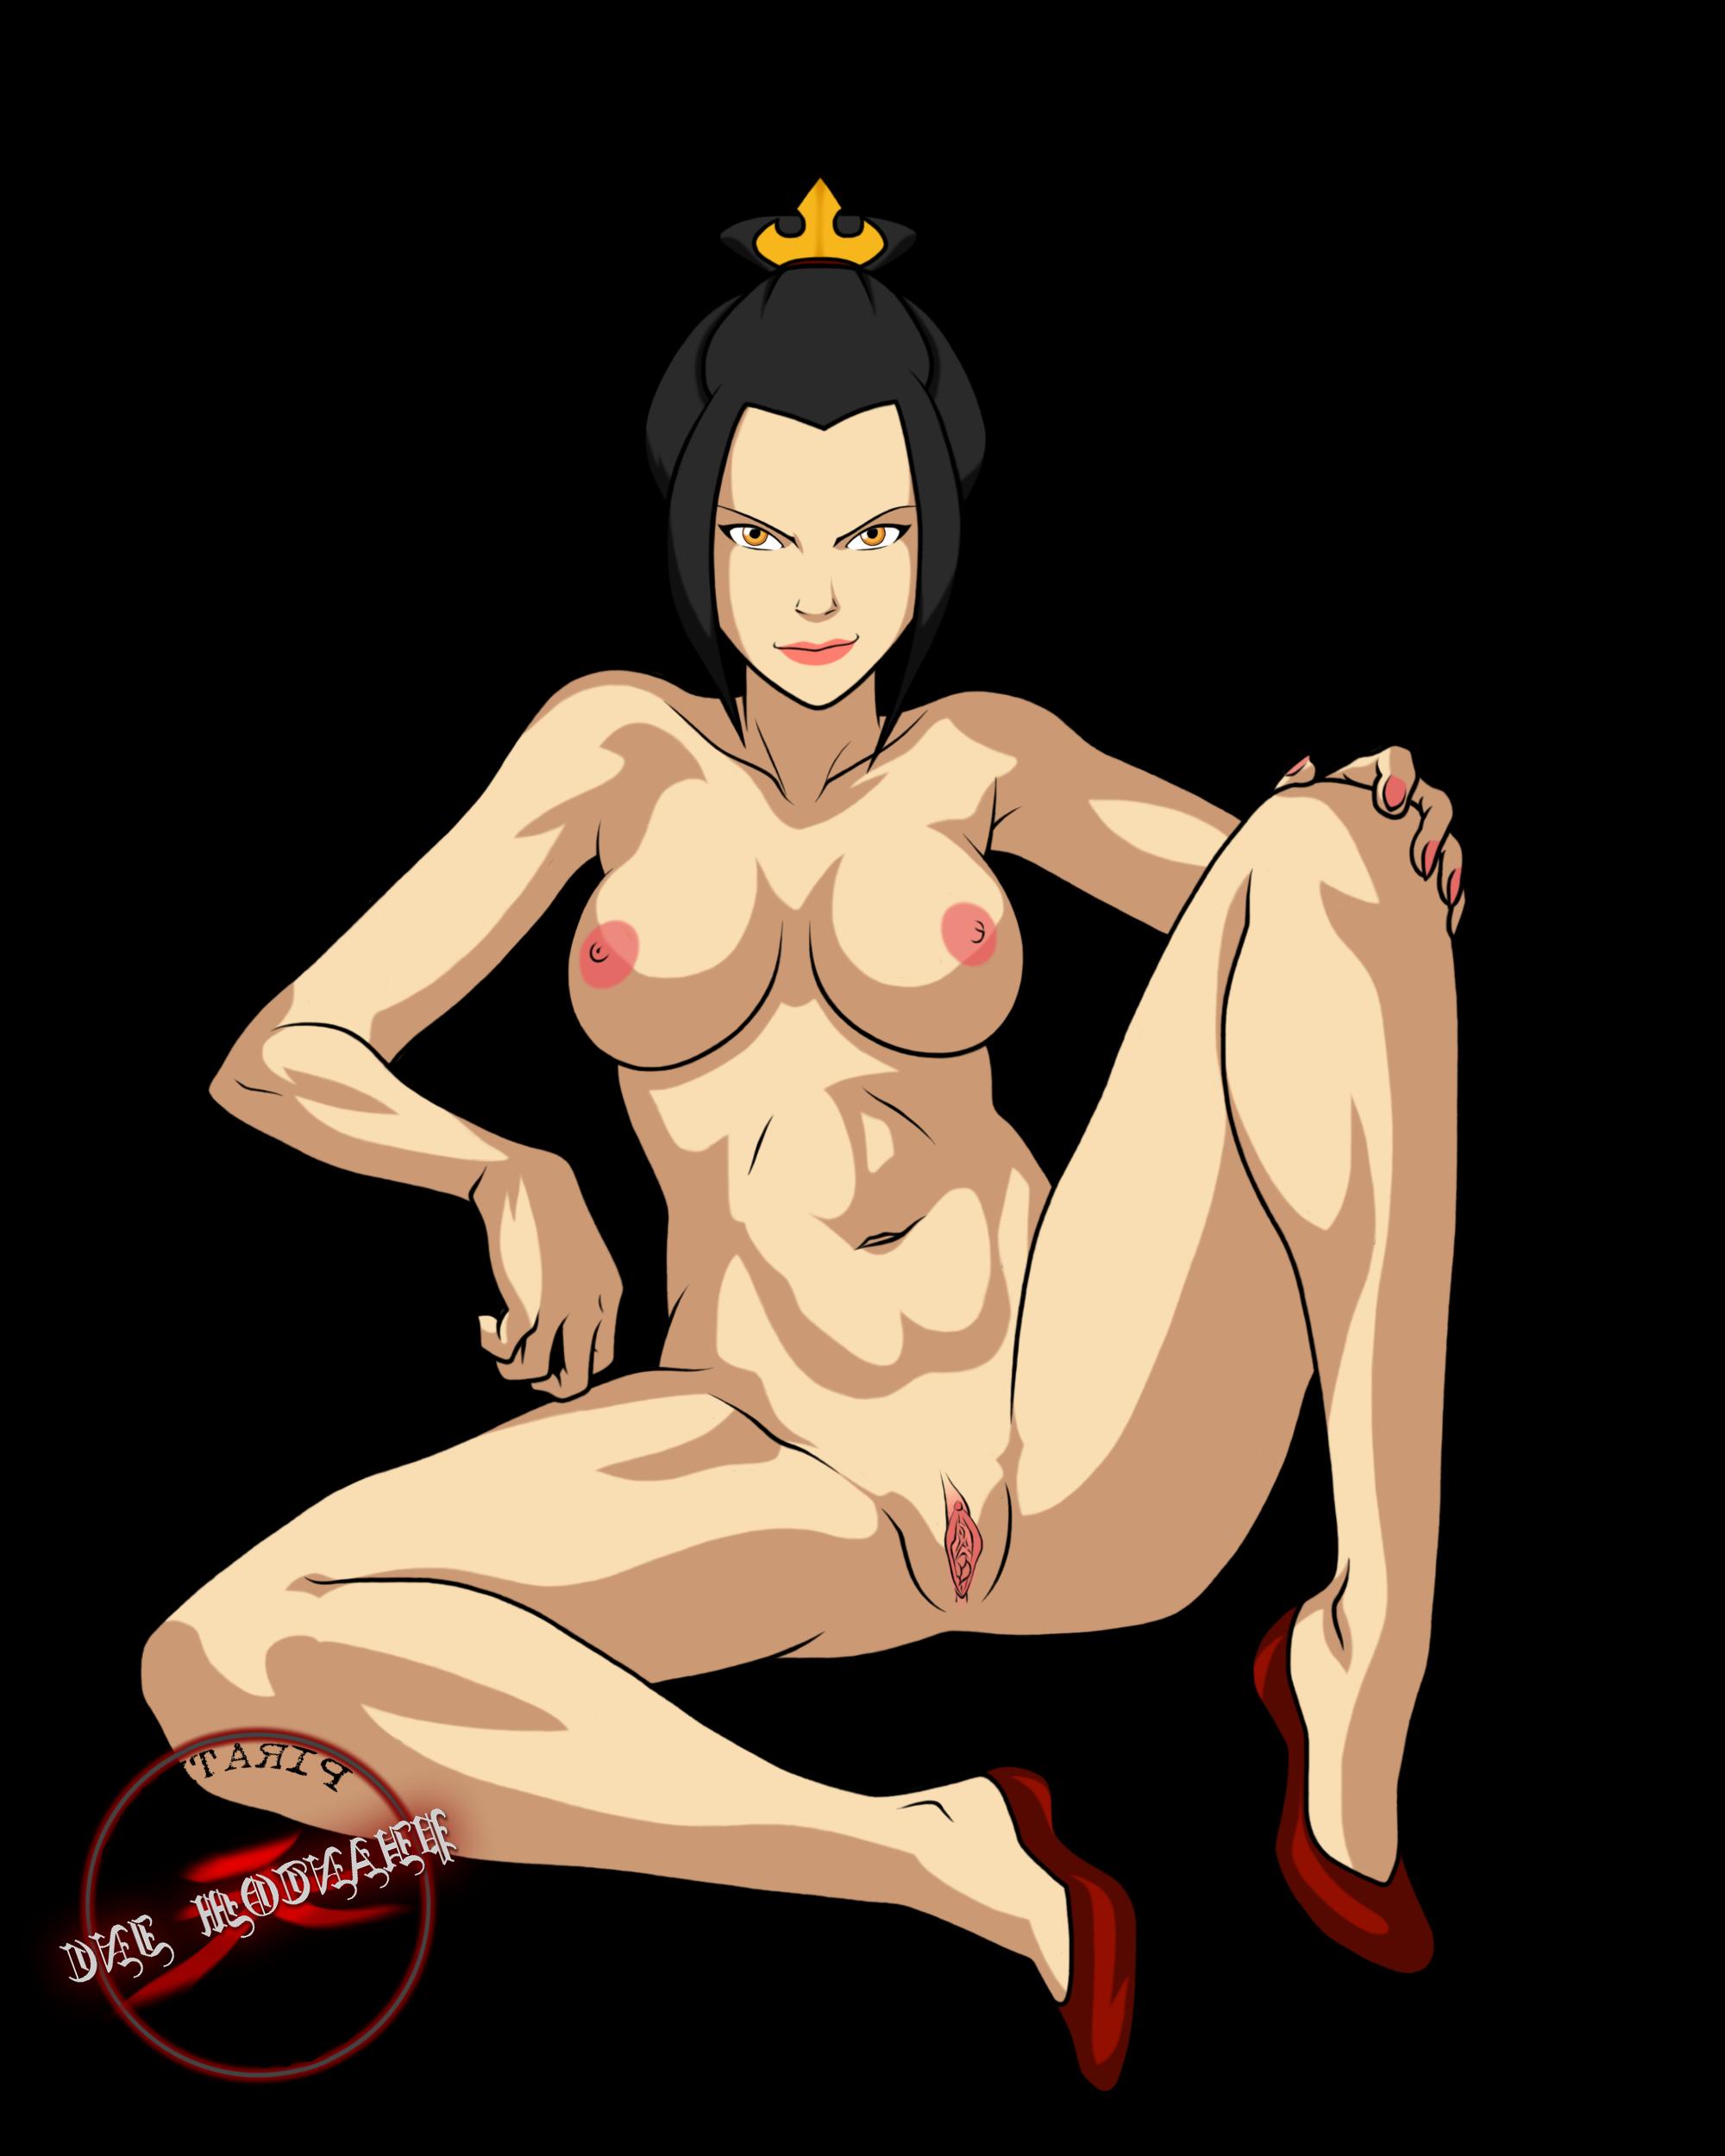 Порно игры аватар легенда об аанге мама зуко